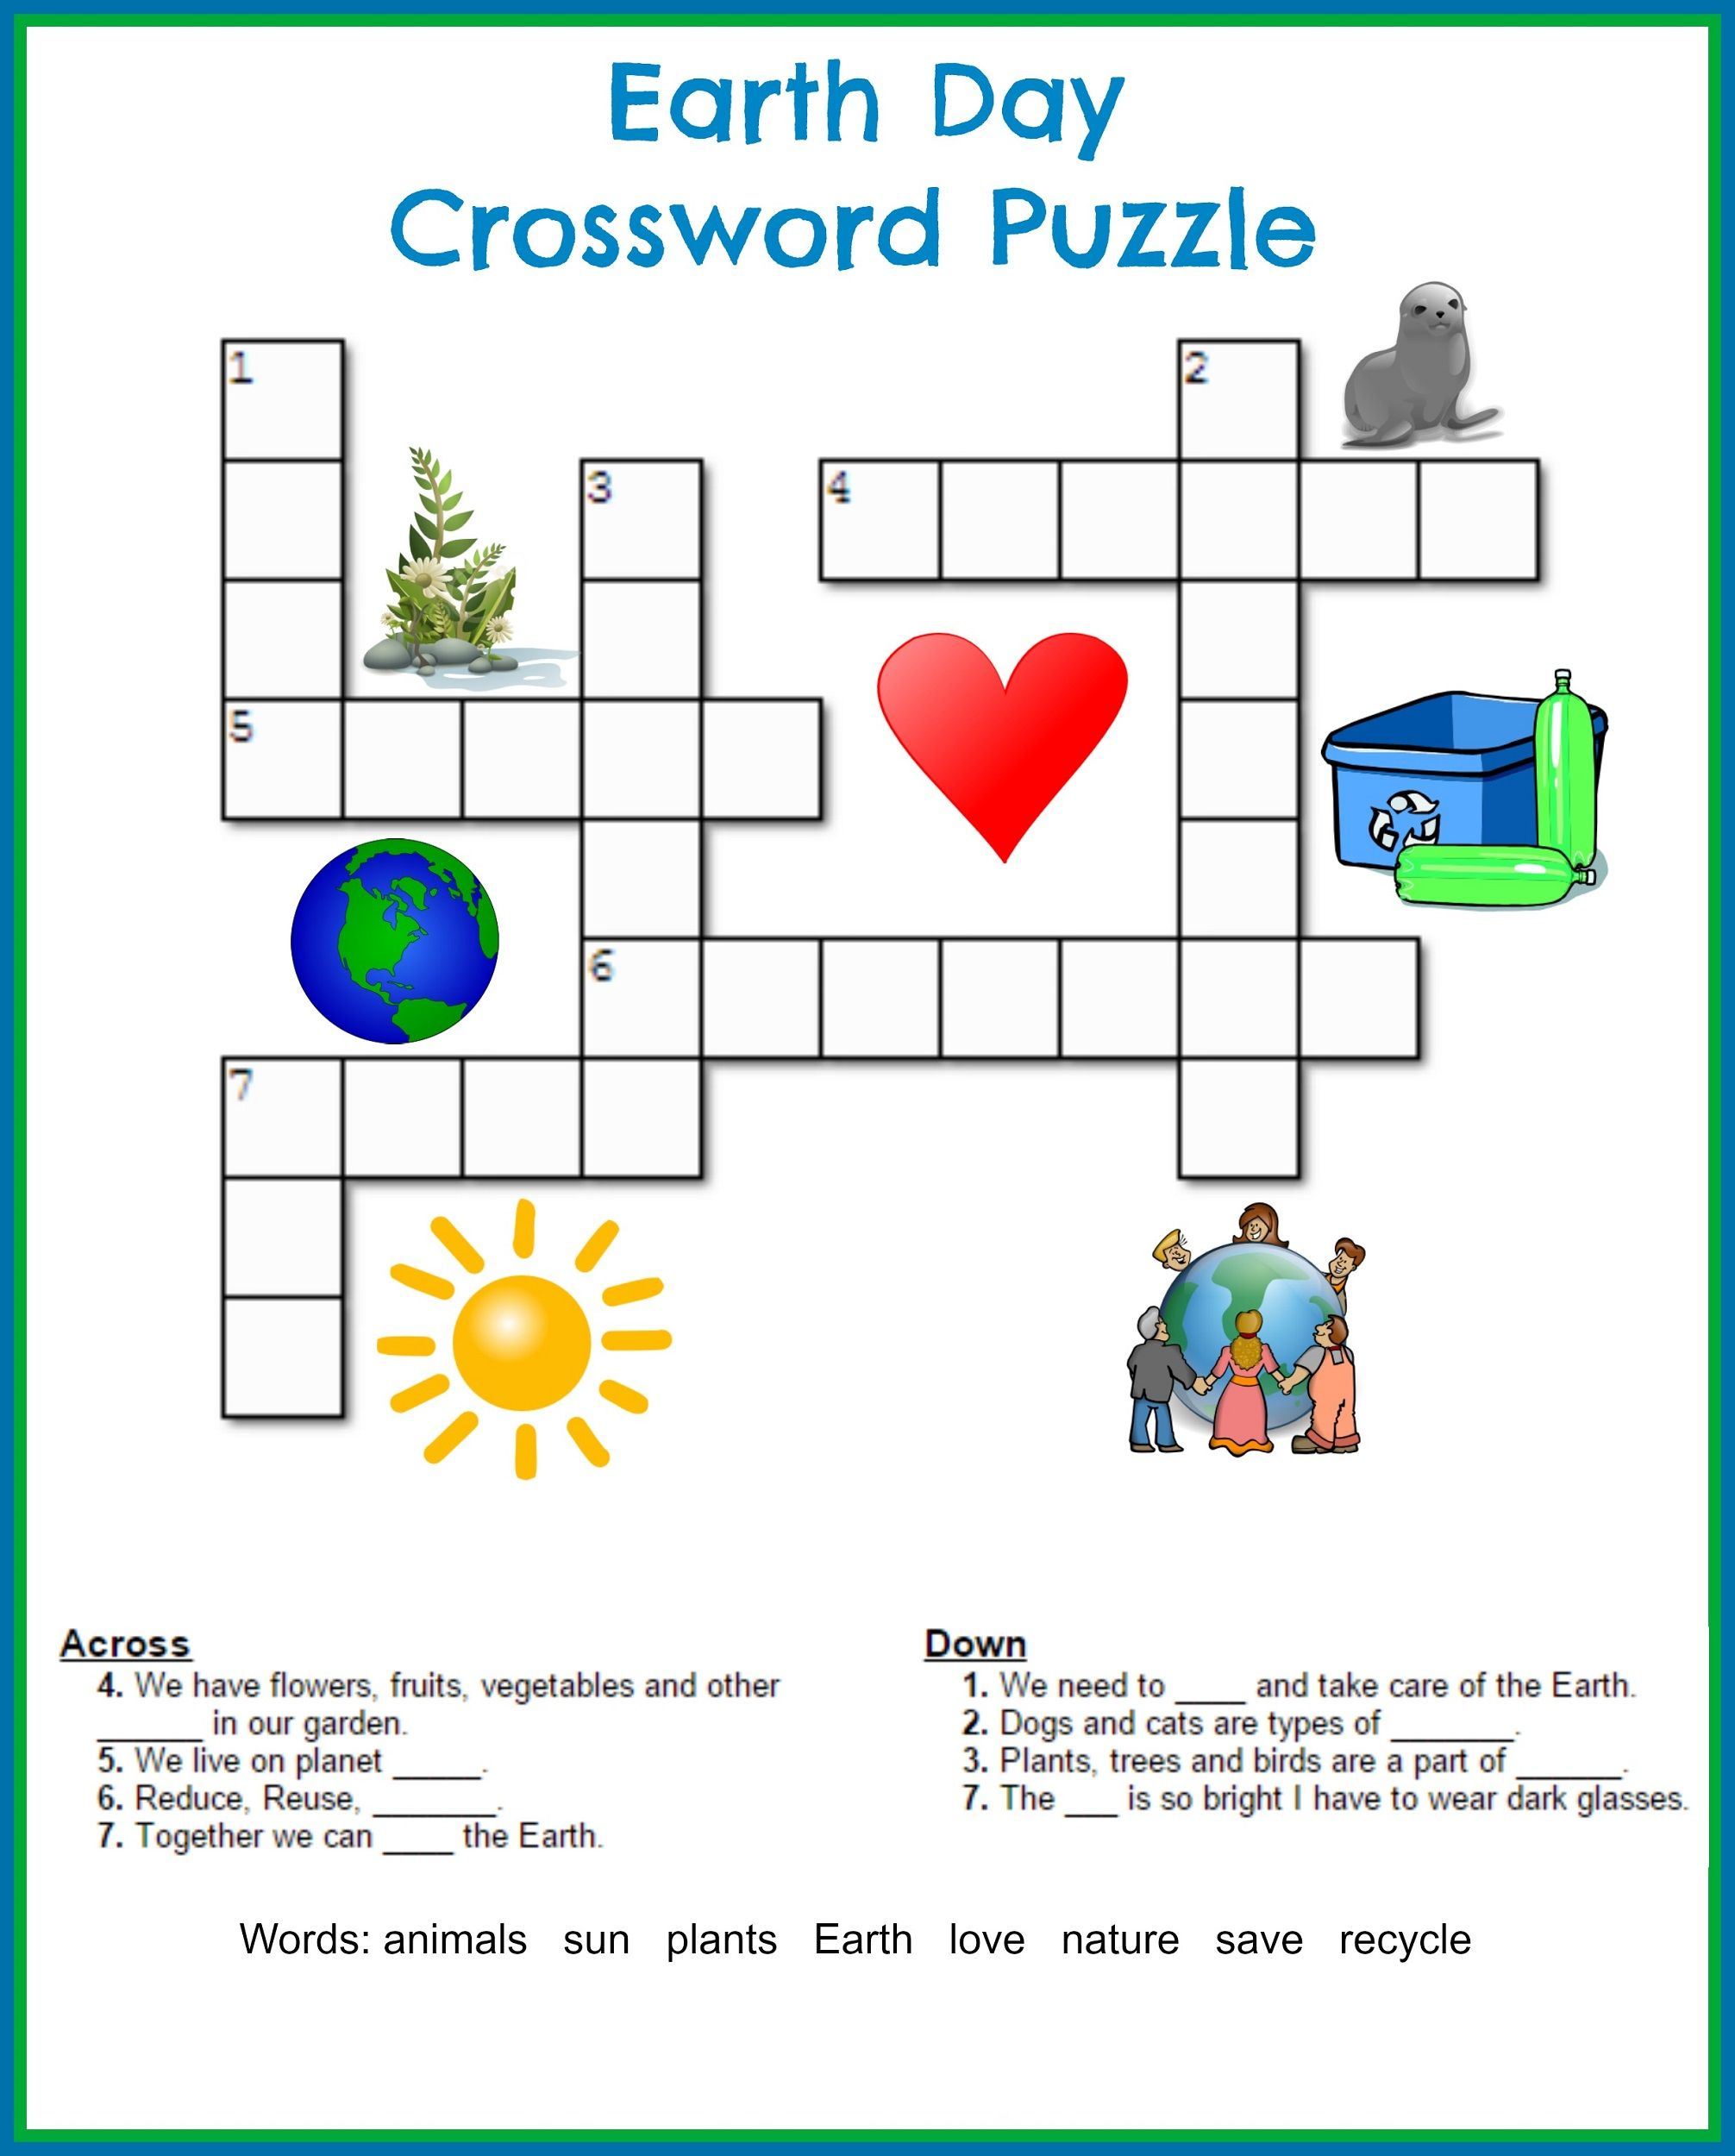 Printable Crossword Puzzles Kids | Crossword Puzzles On Earth - Printable Crossword Puzzles For Kids